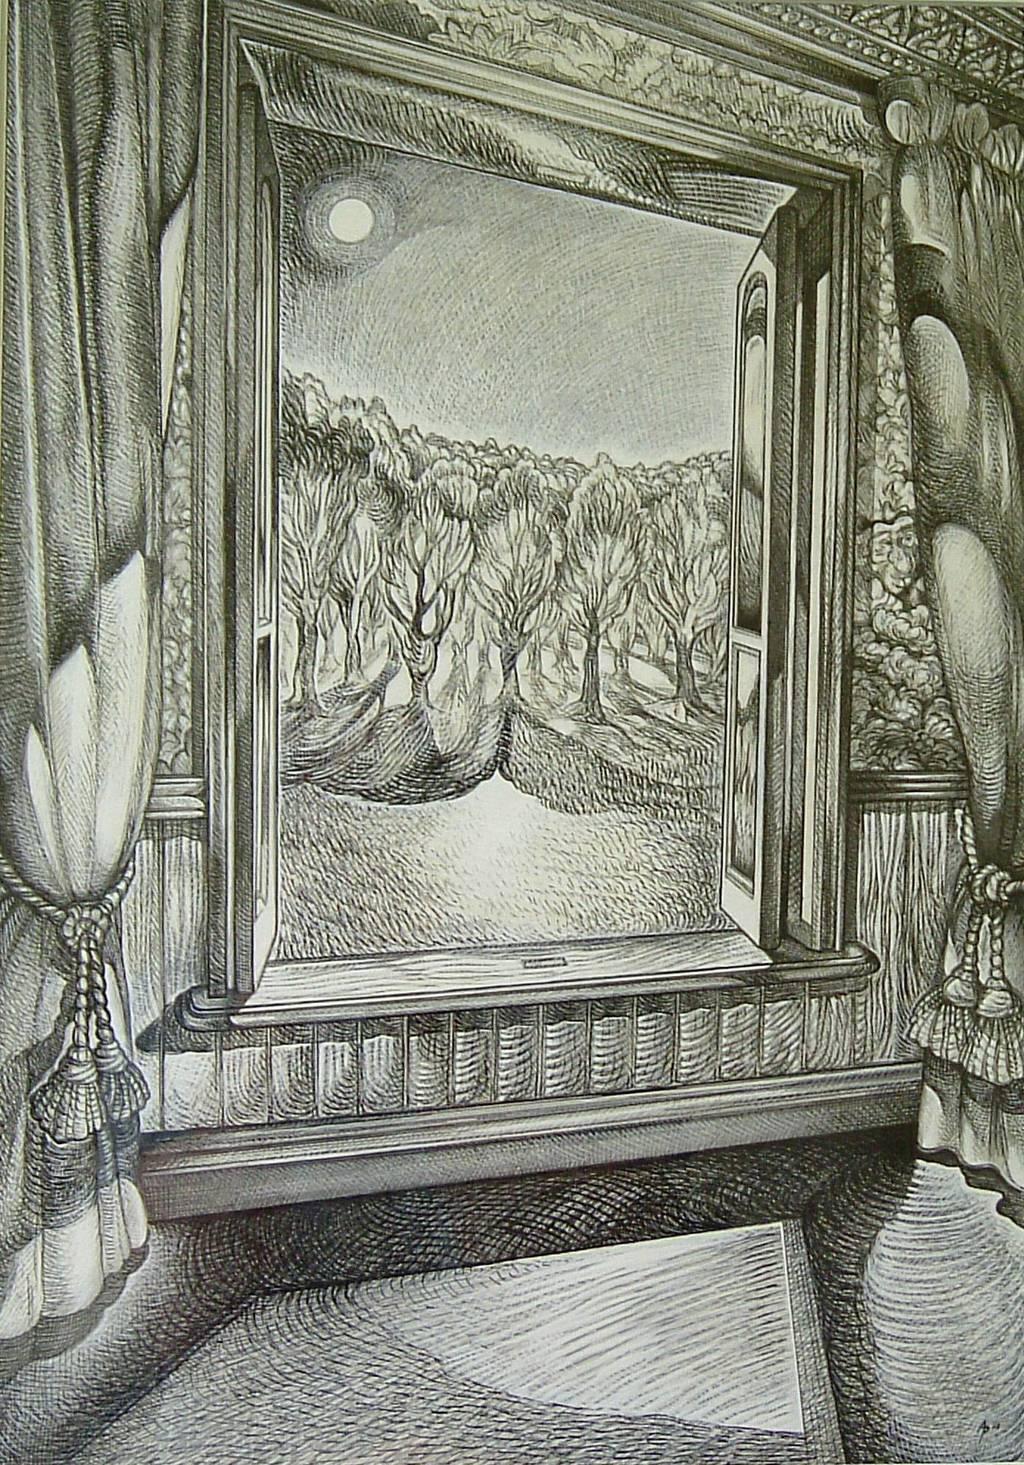 1024x1465 Austen Pinkerton Artwork Moonlight Through Open Window Original